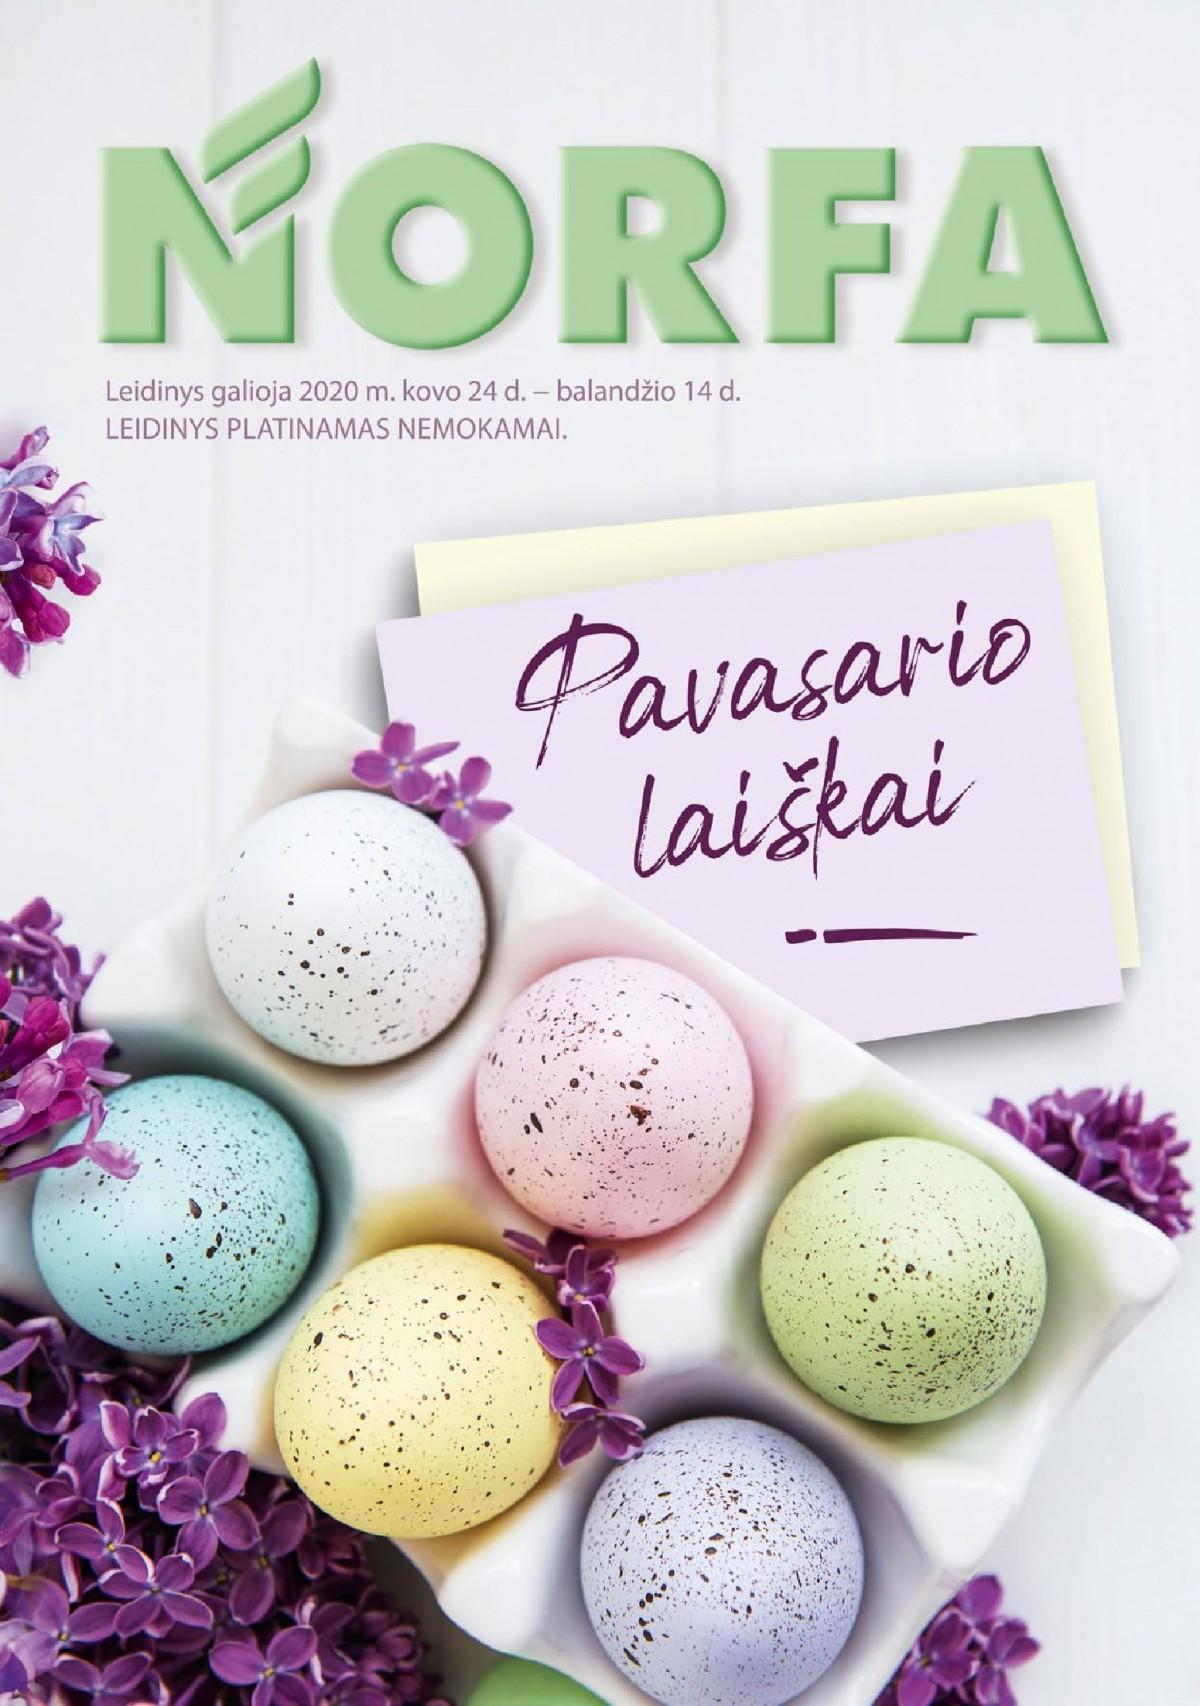 NORFA-VELYKINIS kaininis leidinys (2020.03.24 - 2020.04.14) page 1